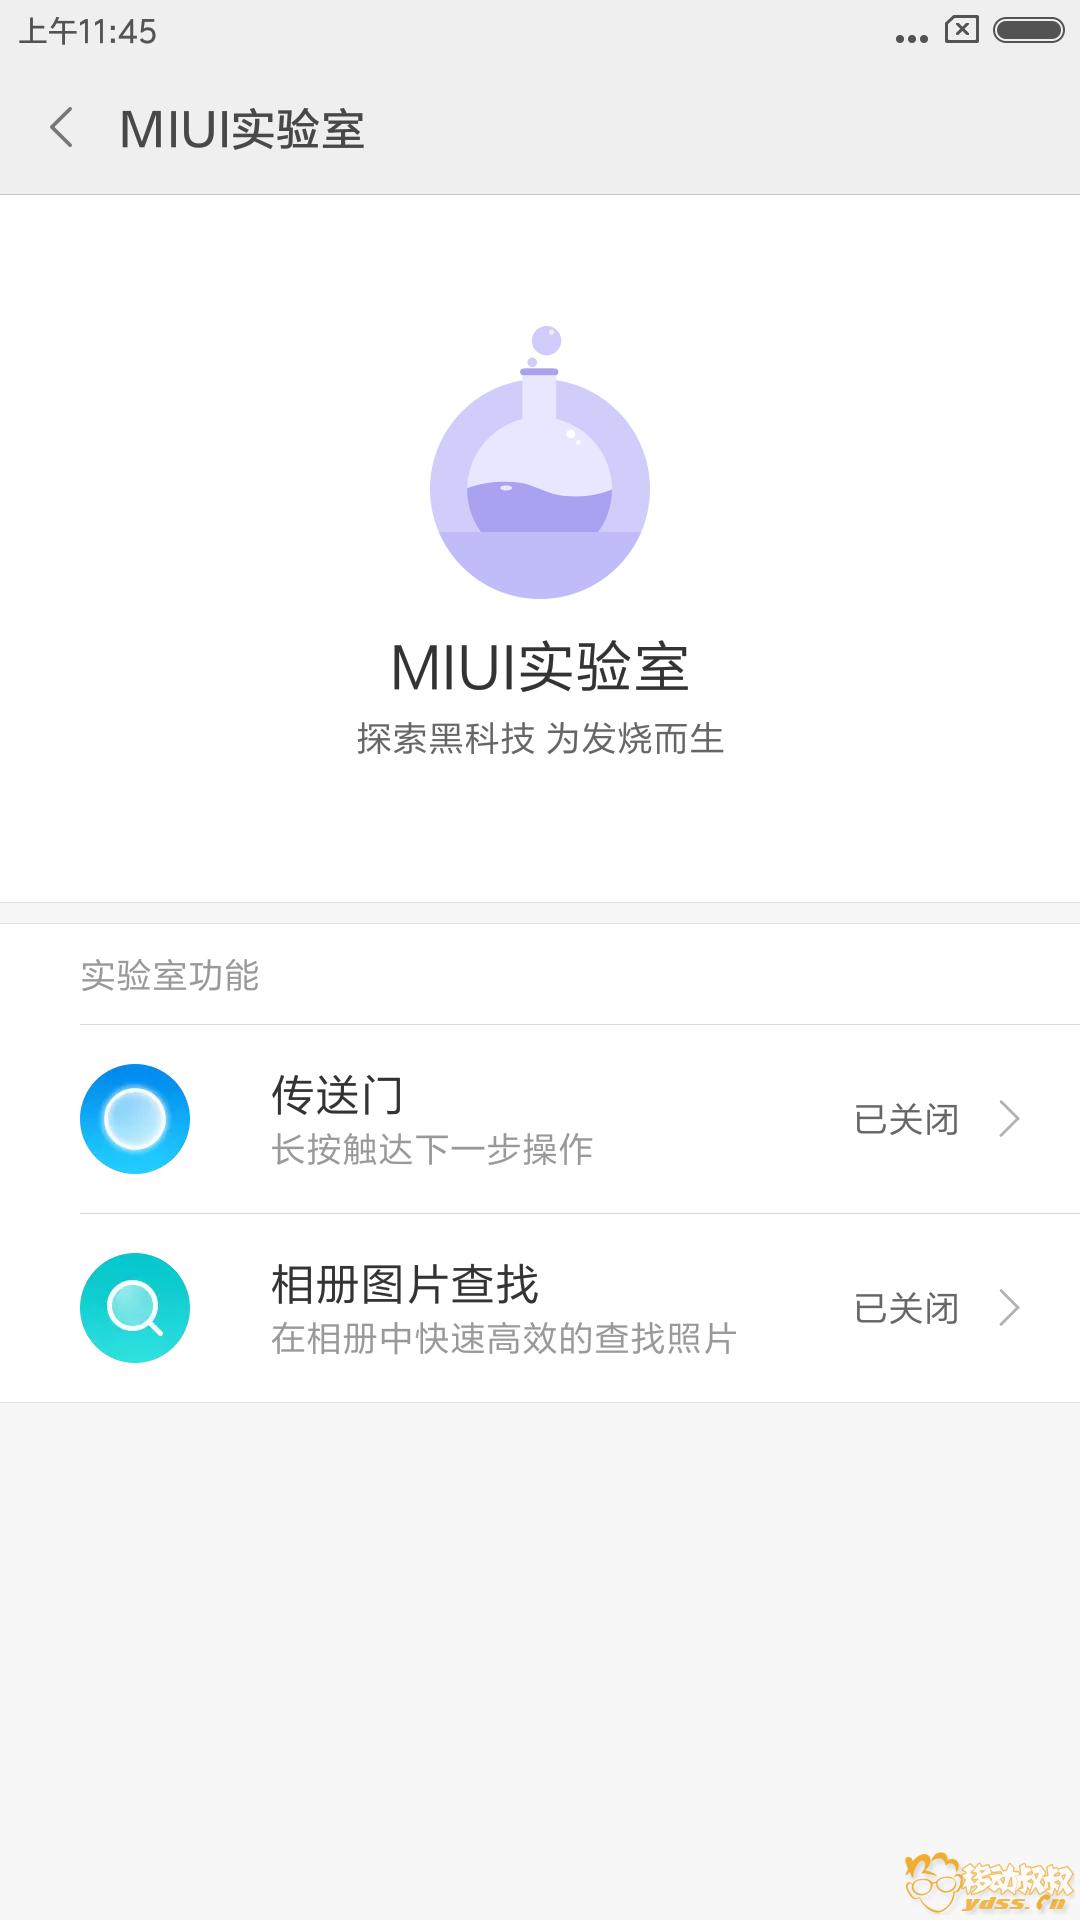 Screenshot_2018-01-07-11-45-41-814_com.android.se.png